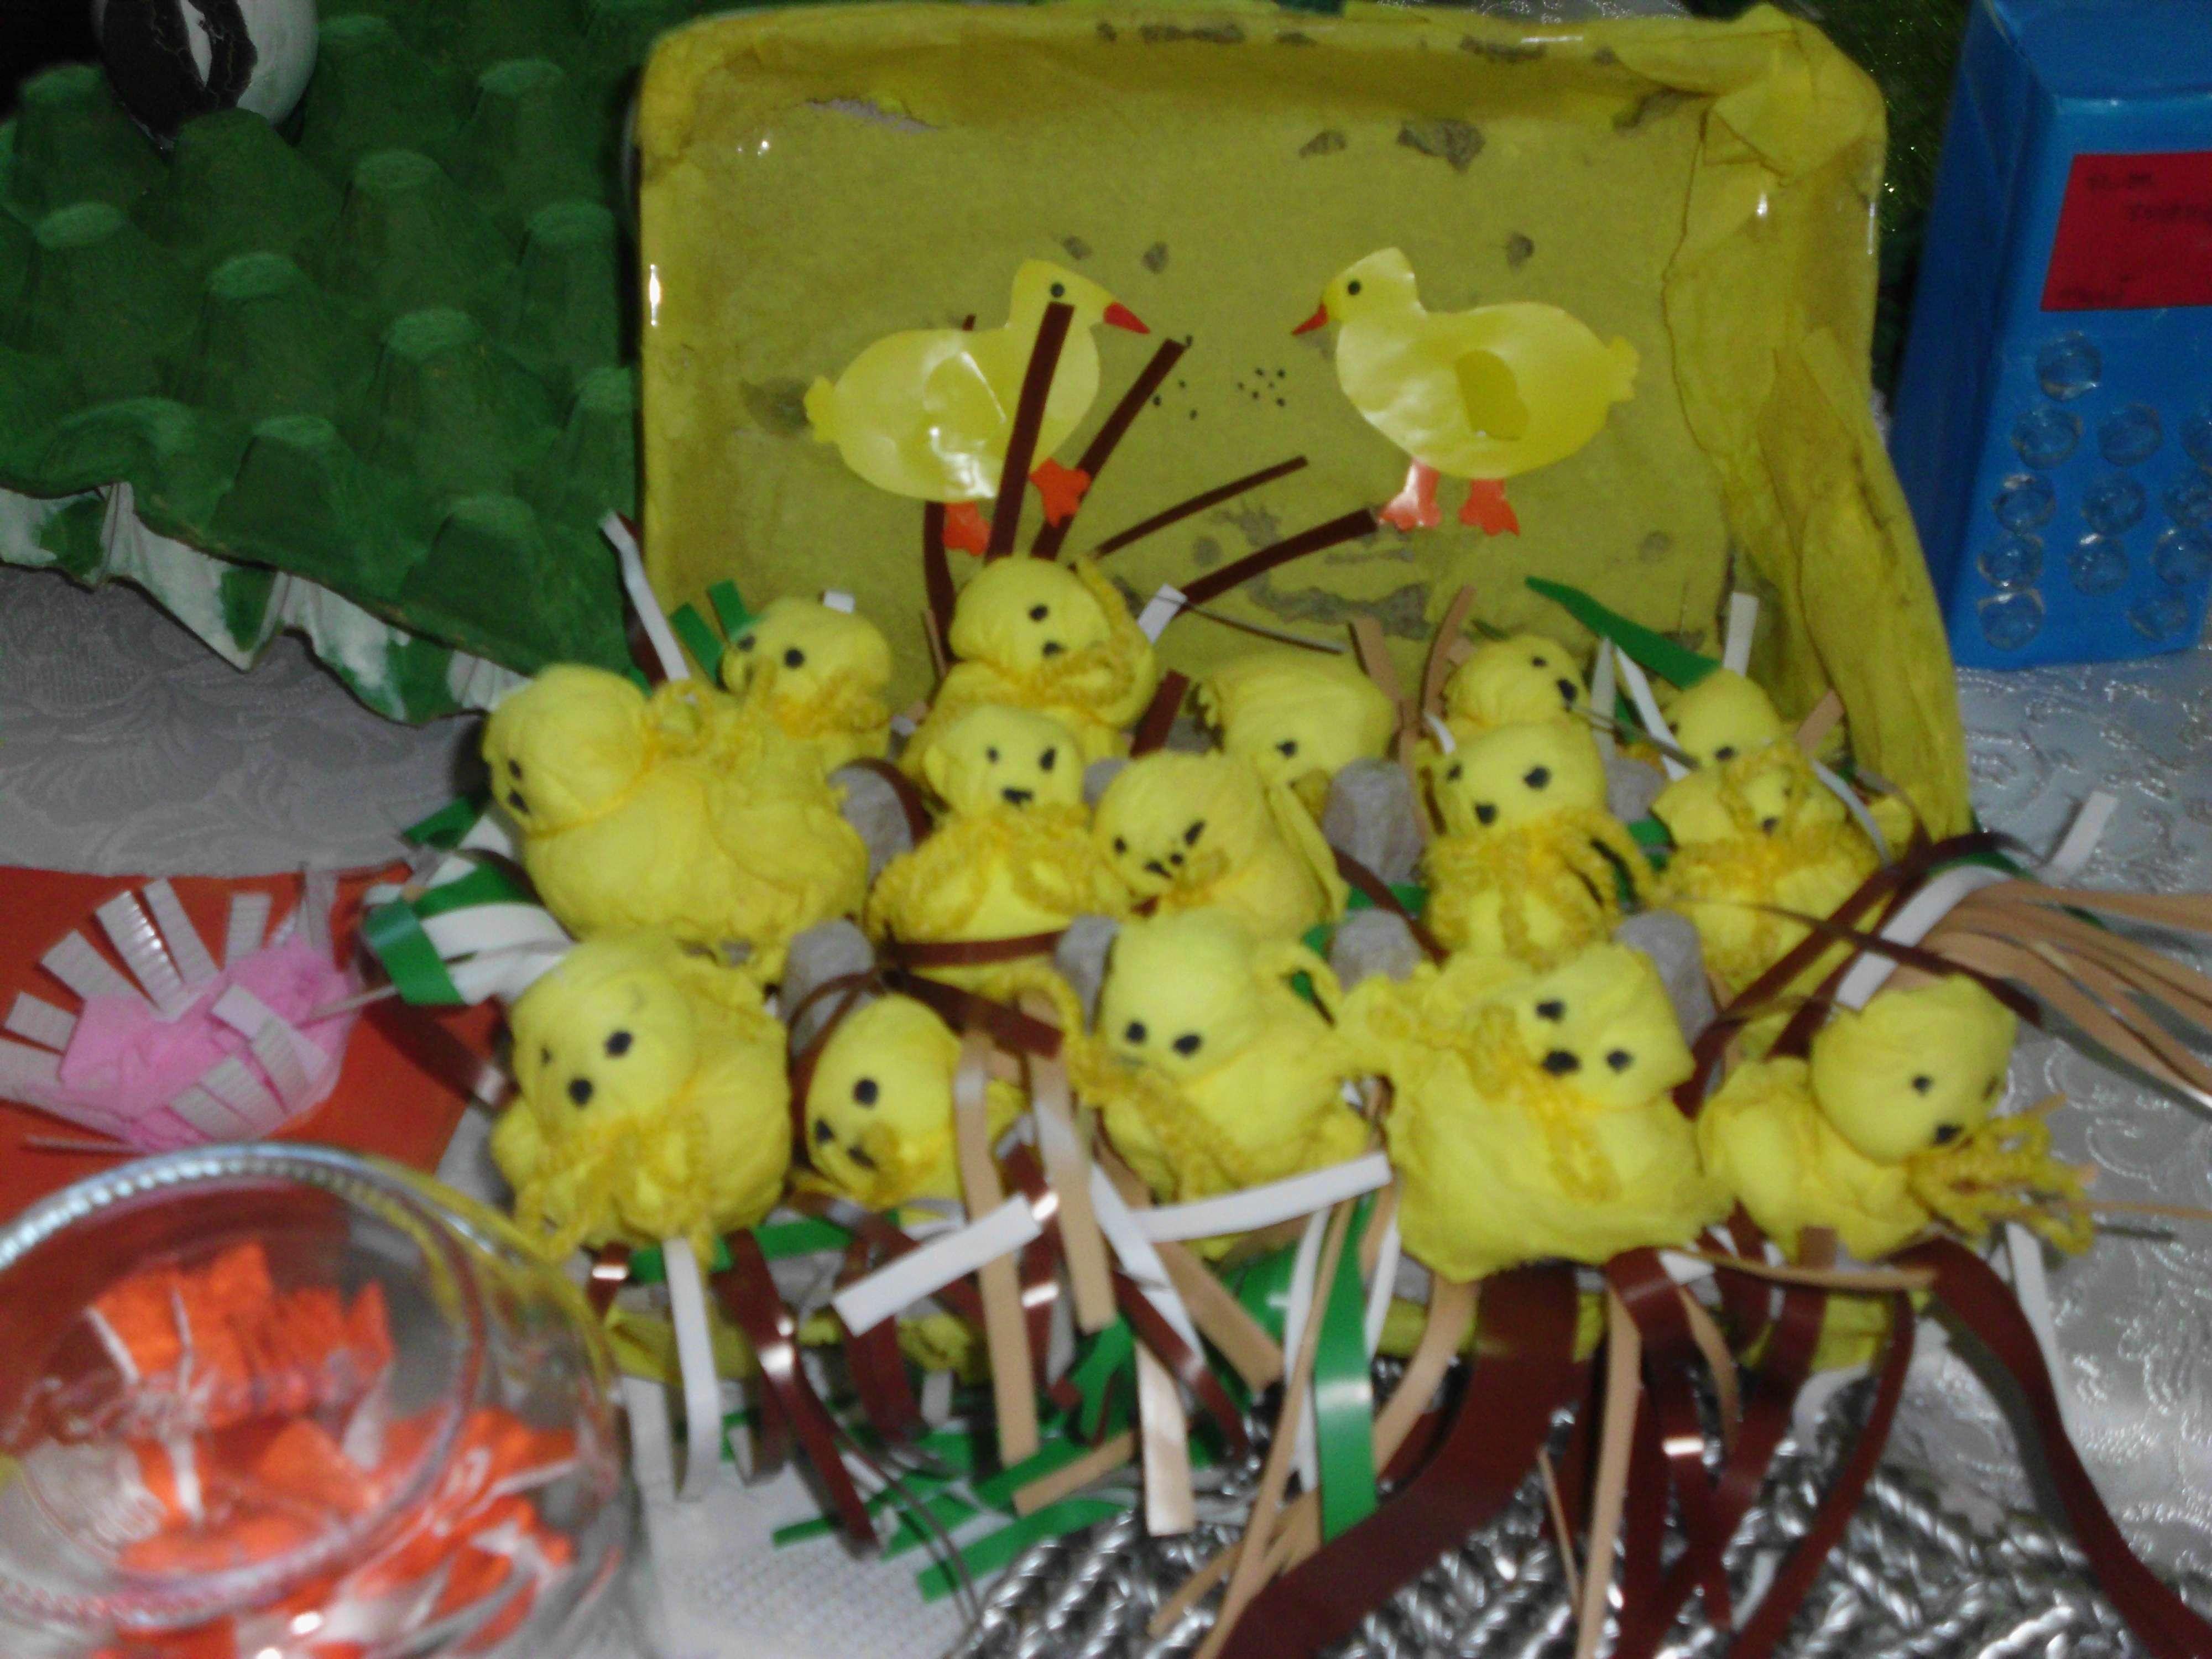 Chick Craft Ideas For Preschool Preschoolplanet